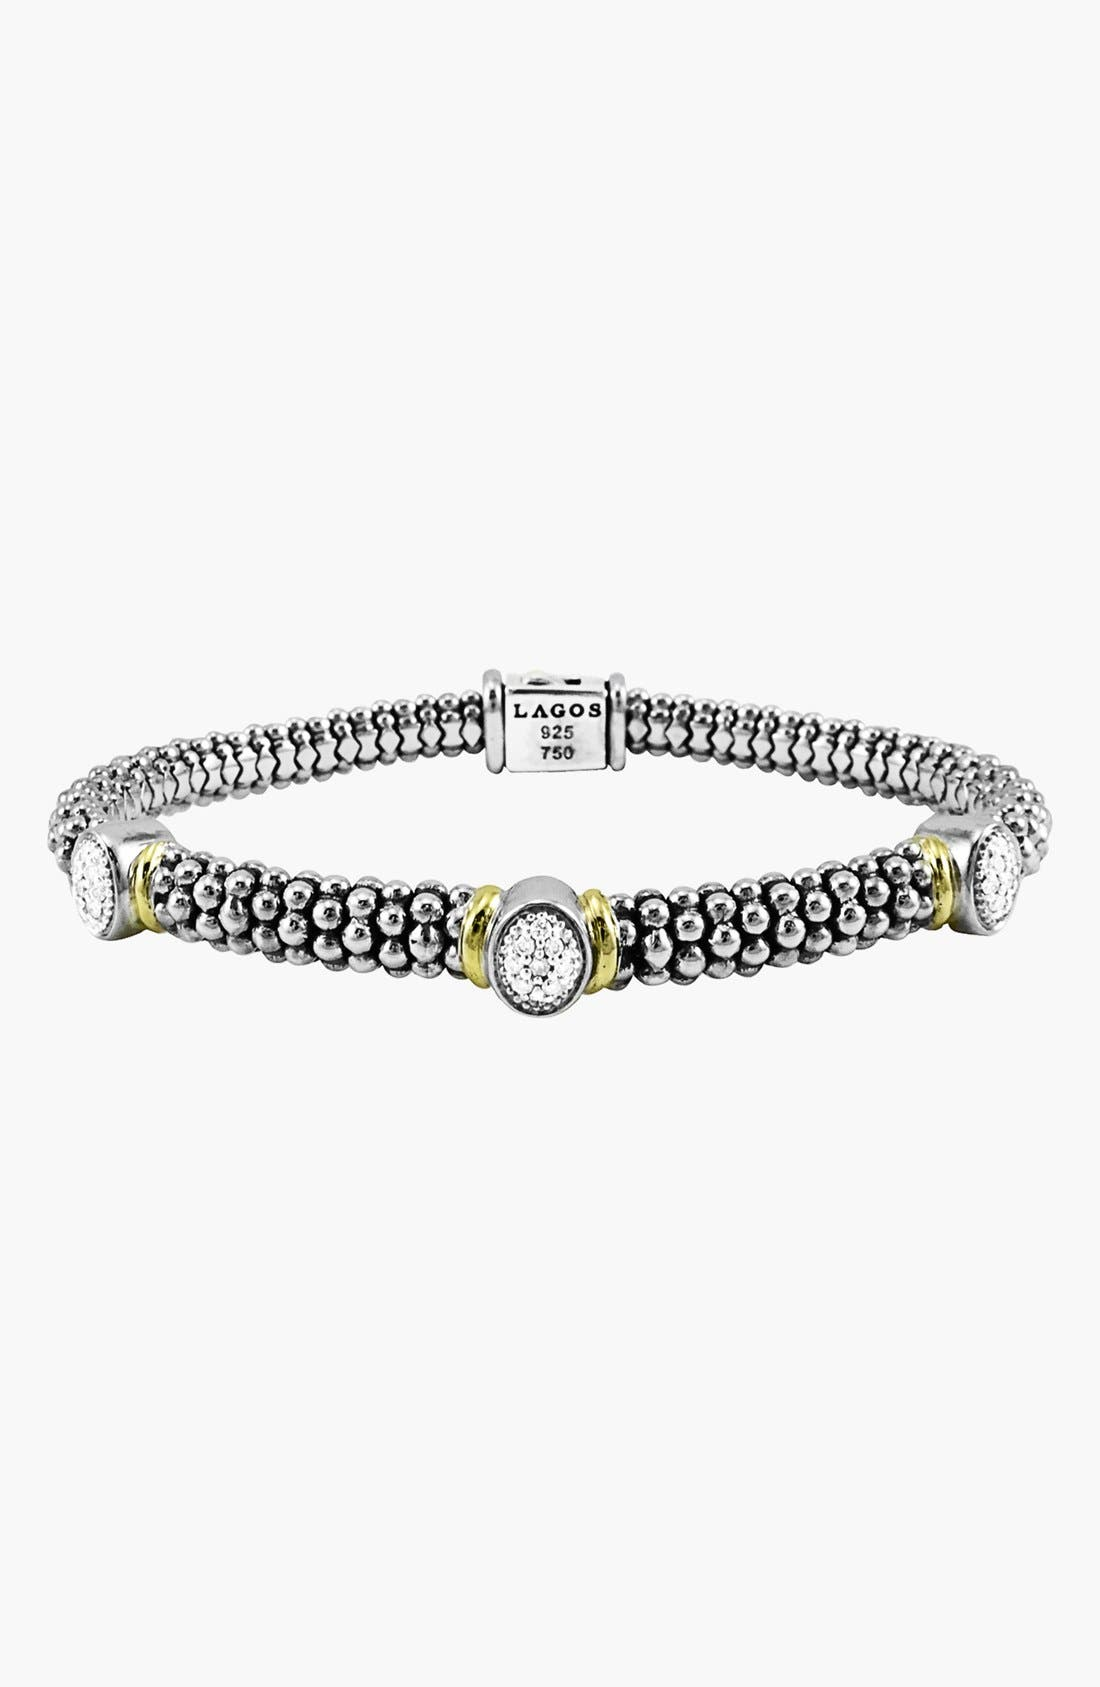 Alternate Image 1 Selected - Lagos 'Twilight' Caviar™ Diamond Rope Bracelet (Online Only)